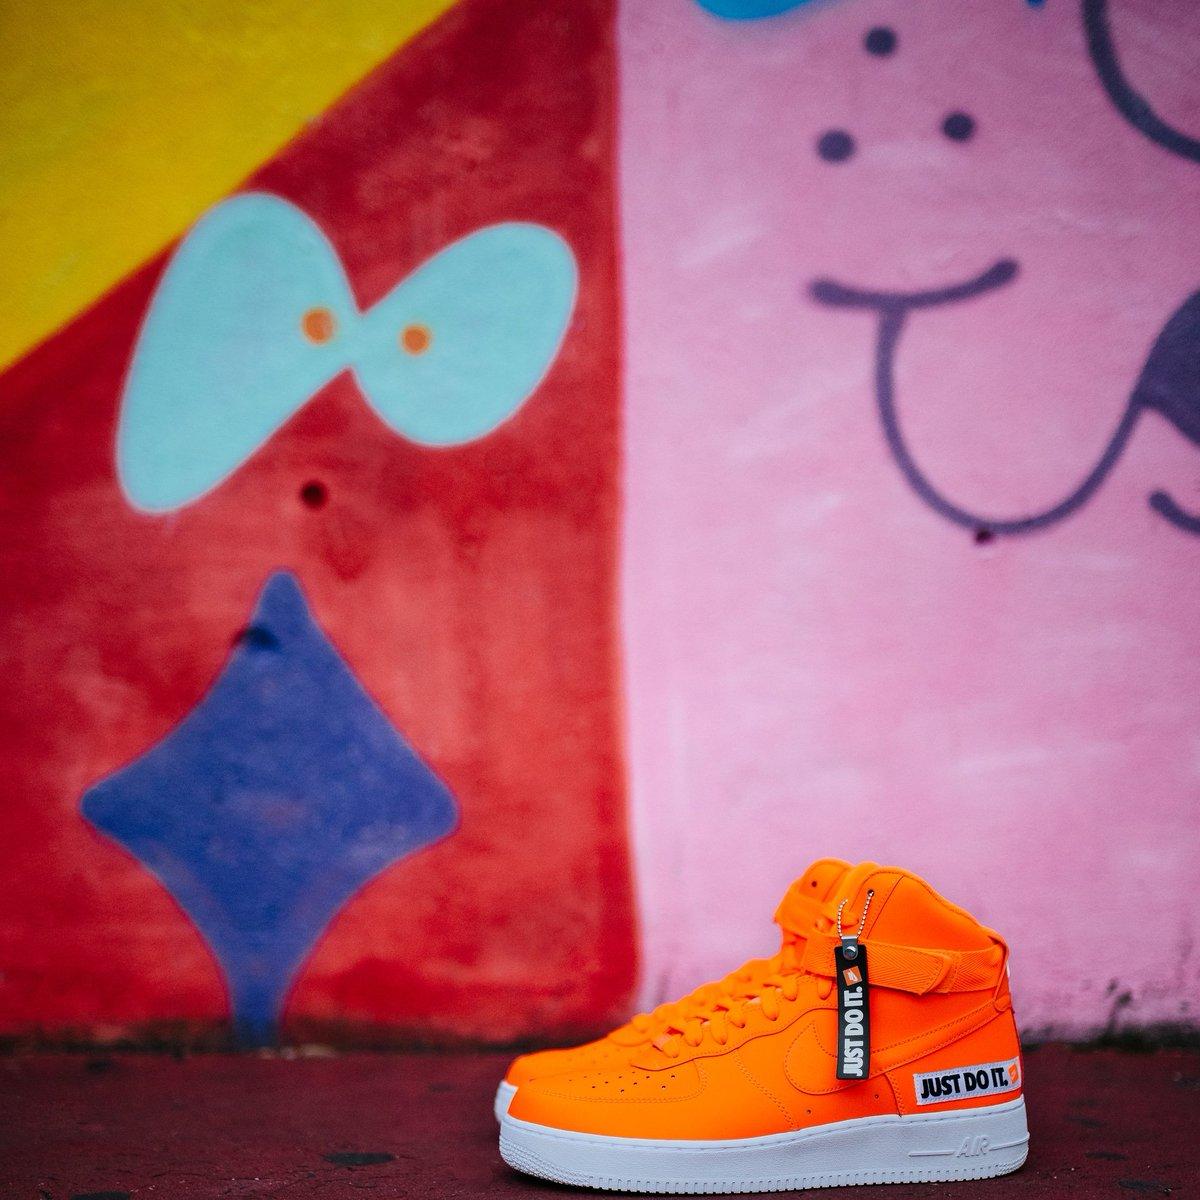 31bb6e17559 The Nike